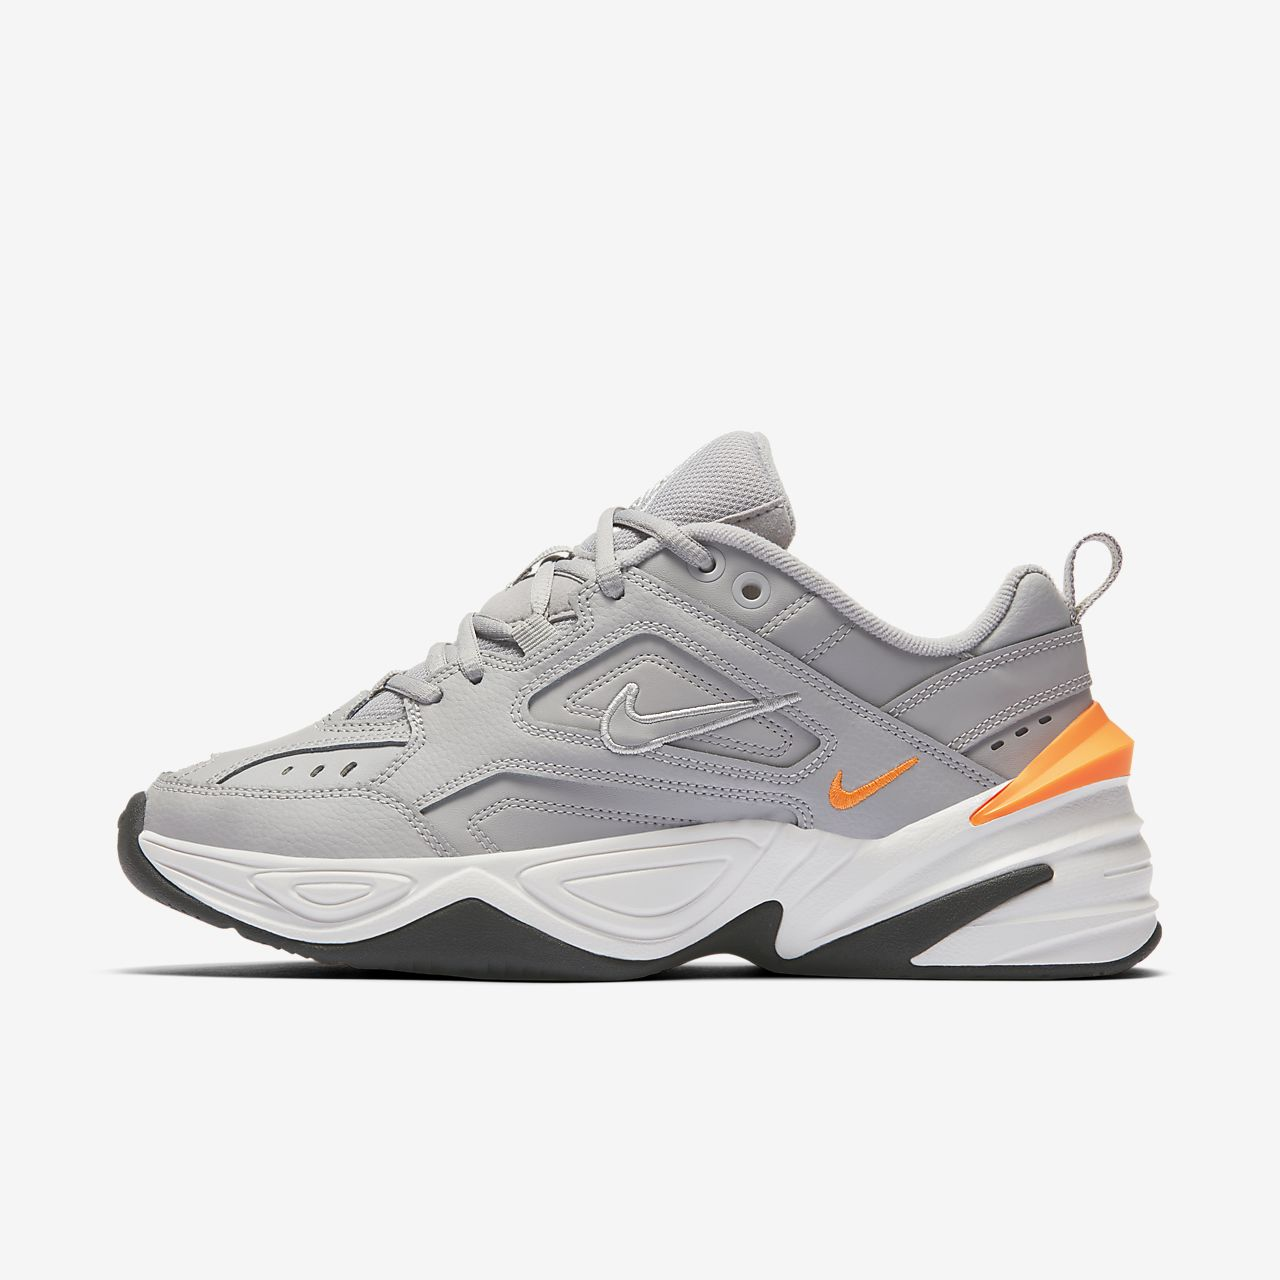 promo code a207e a2192 Chaussure Nike M2K Tekno pour Femme ...